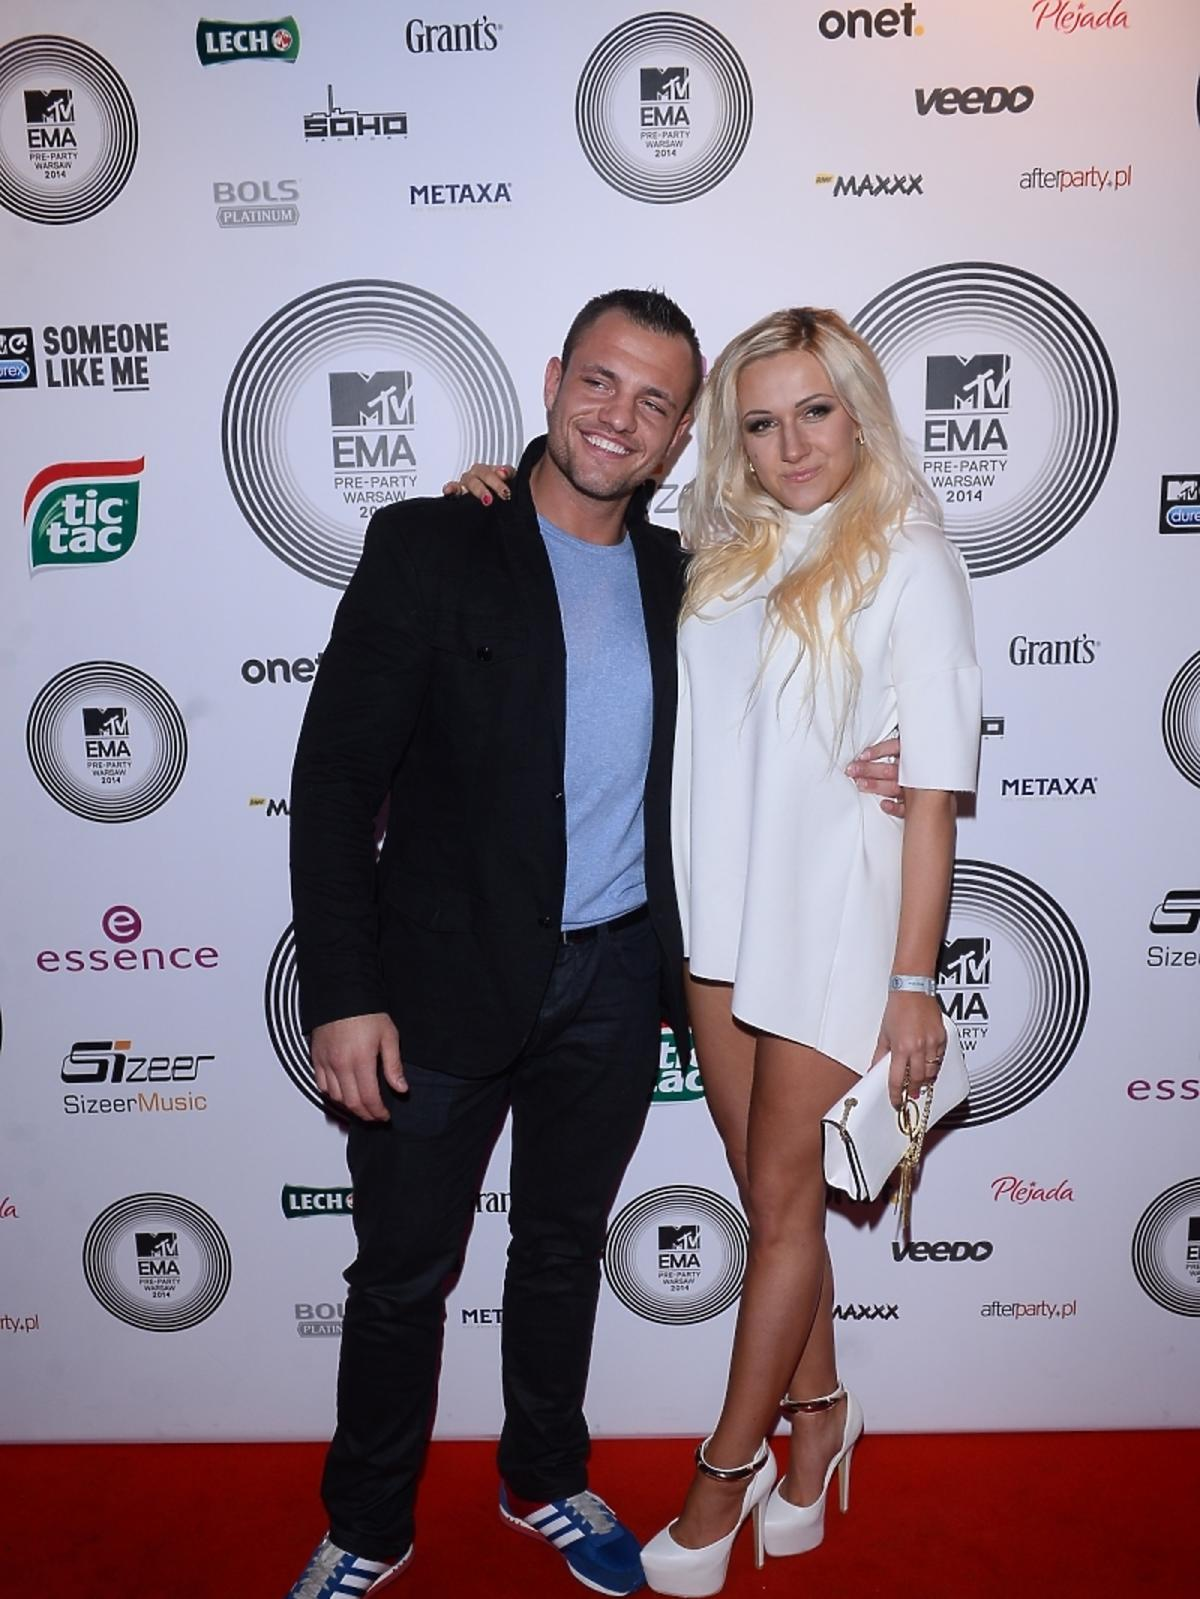 Eliza i Trybson z Warsaw Shore na MTV EMA PreParty 2014